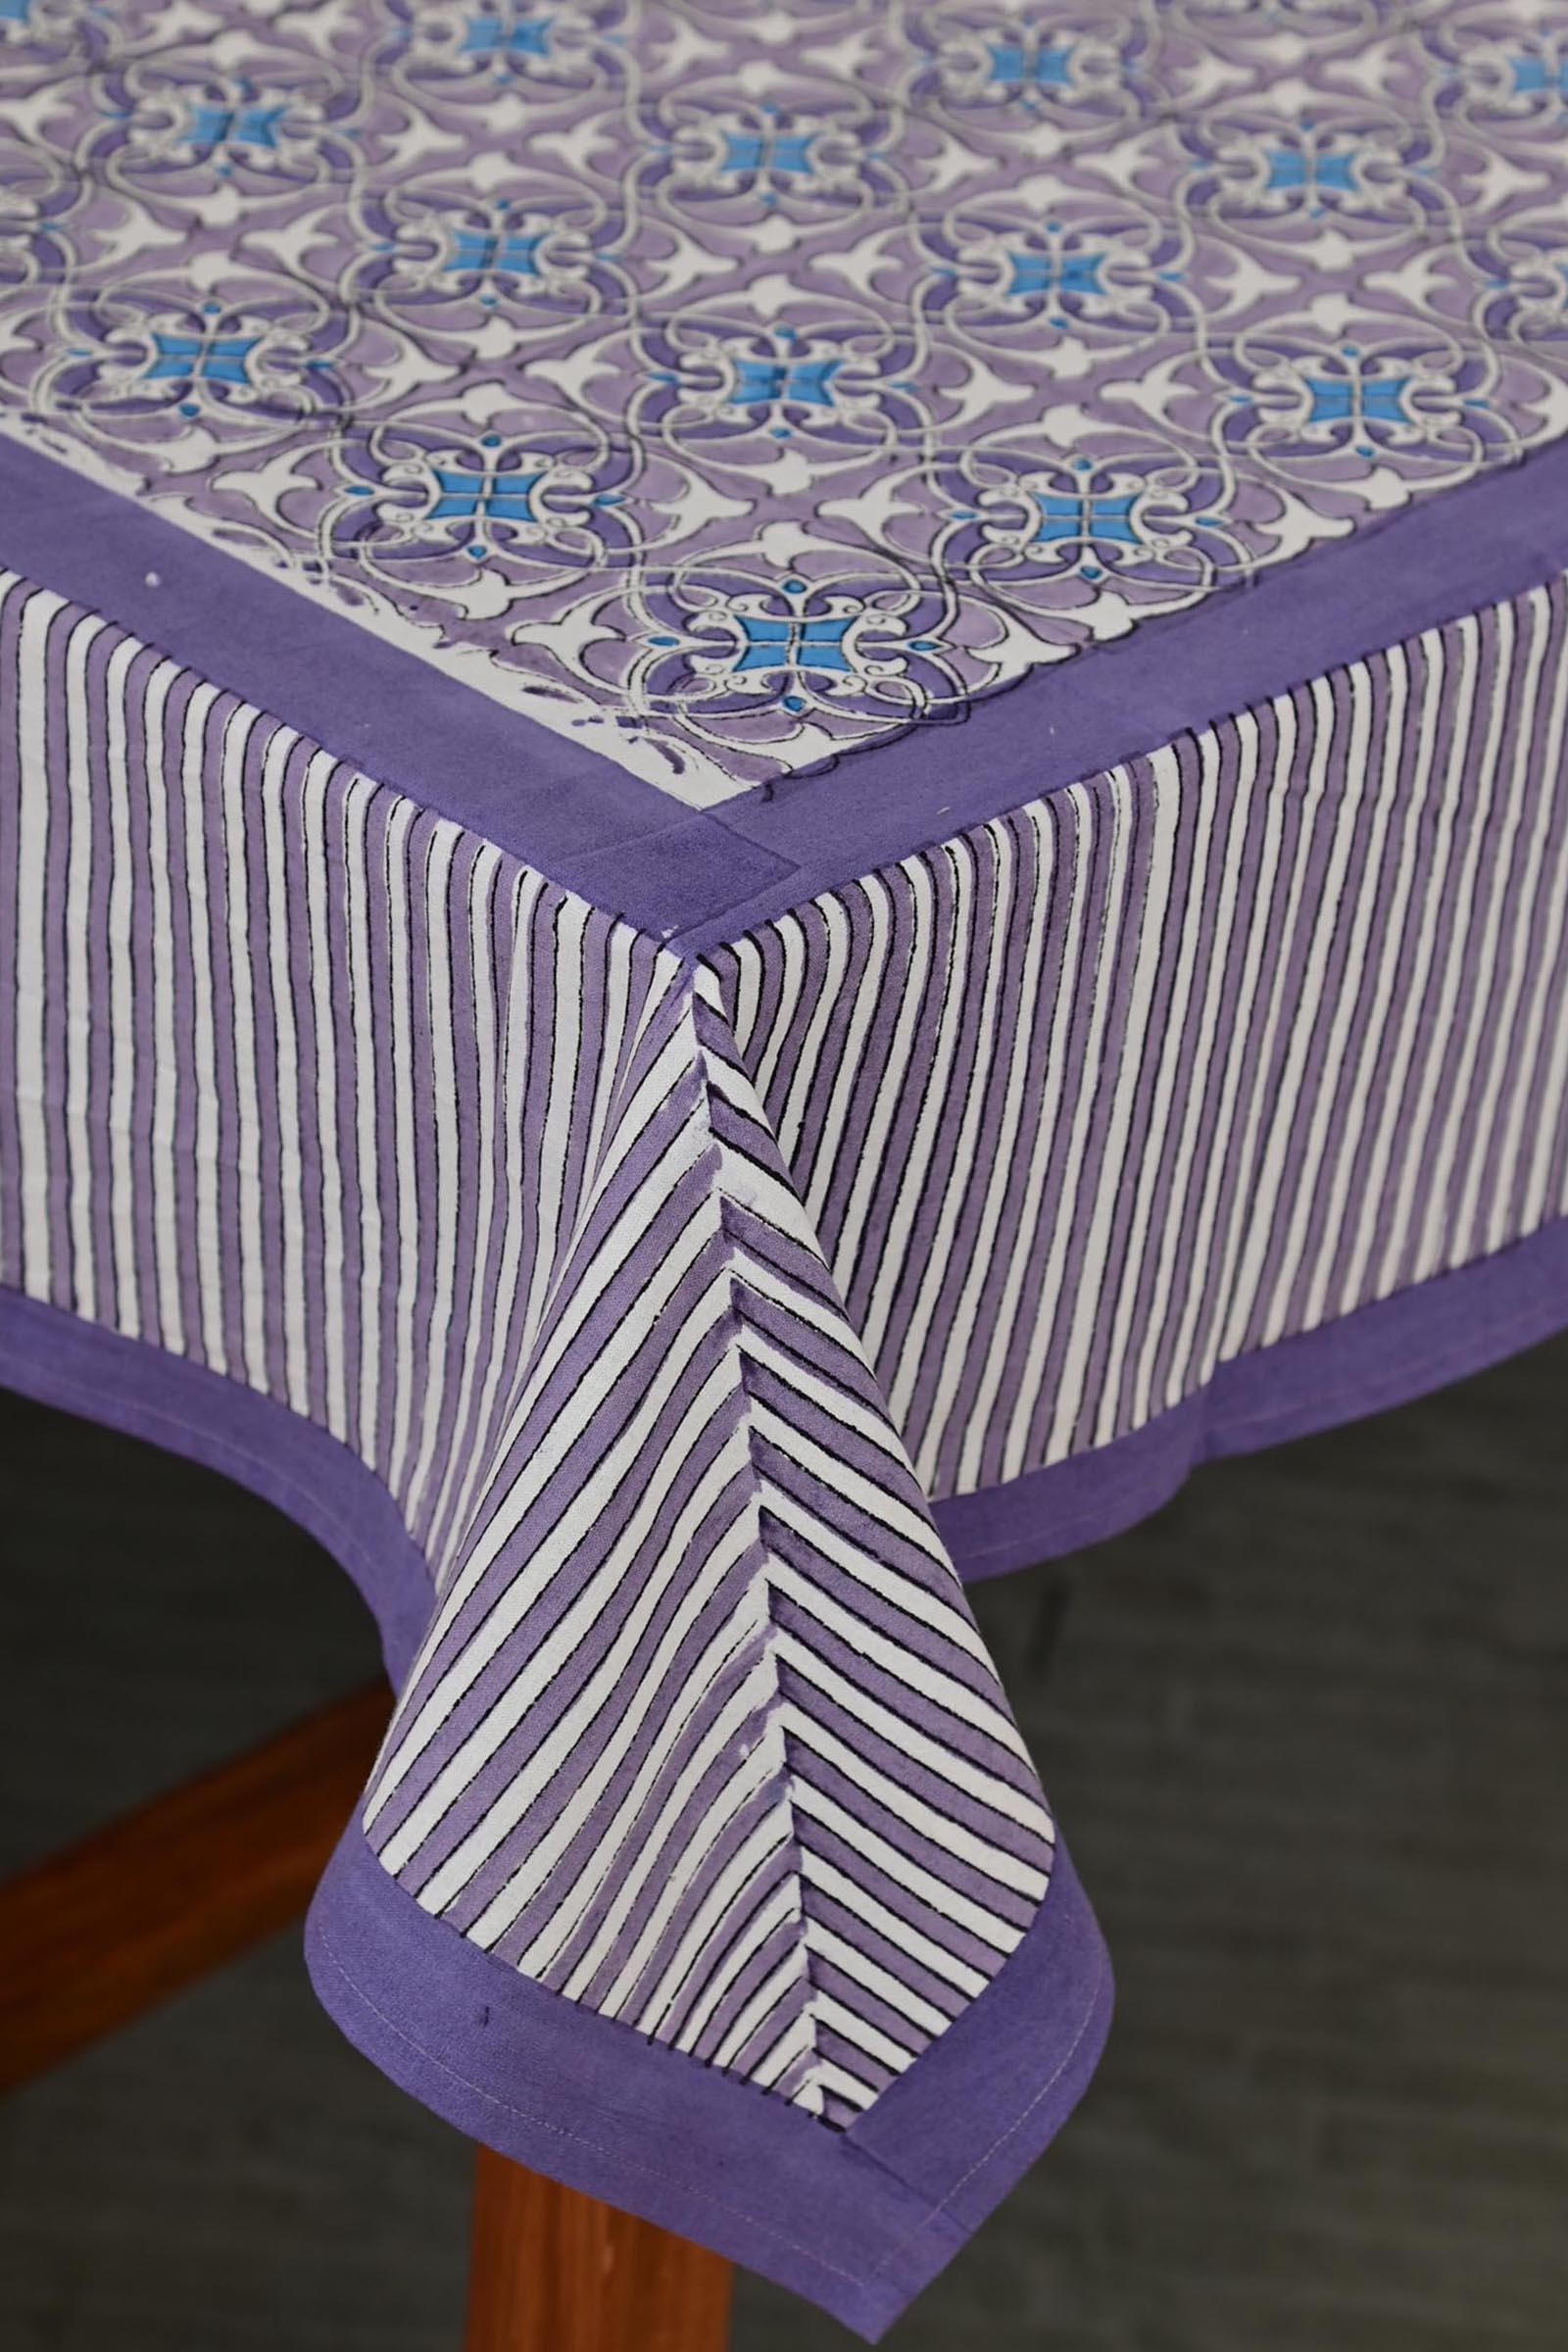 Artistic Lavender Table Cloth